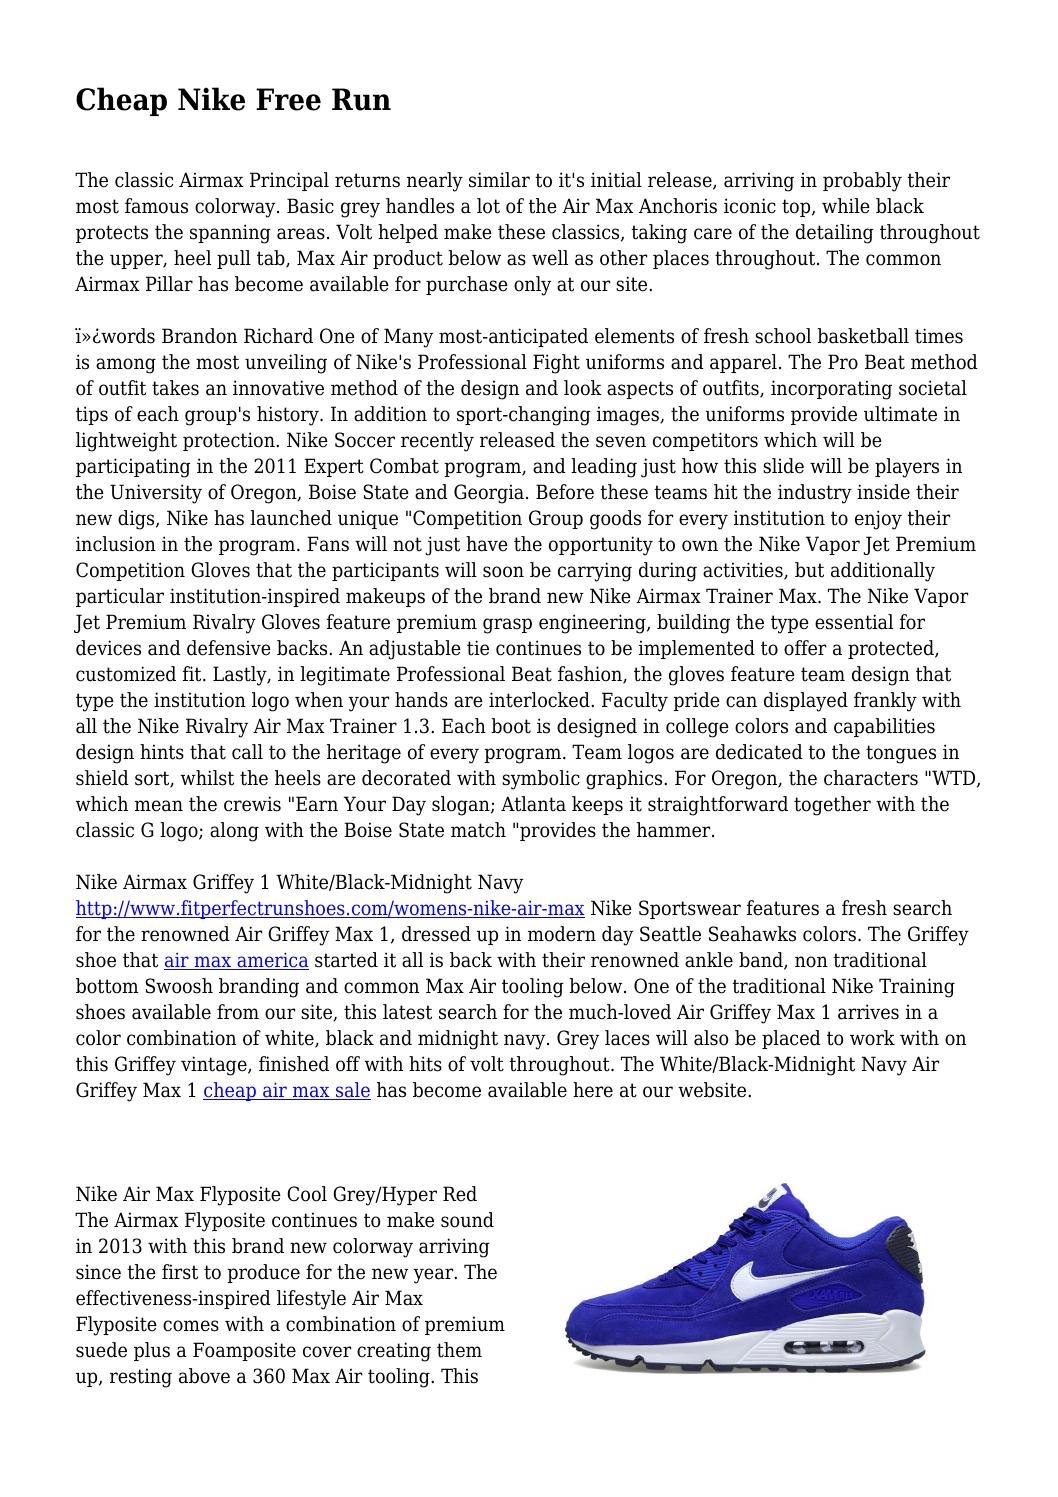 finest selection 2109f cc8f4 Cheap Nike Free Run by tranquilnurture81 - issuu